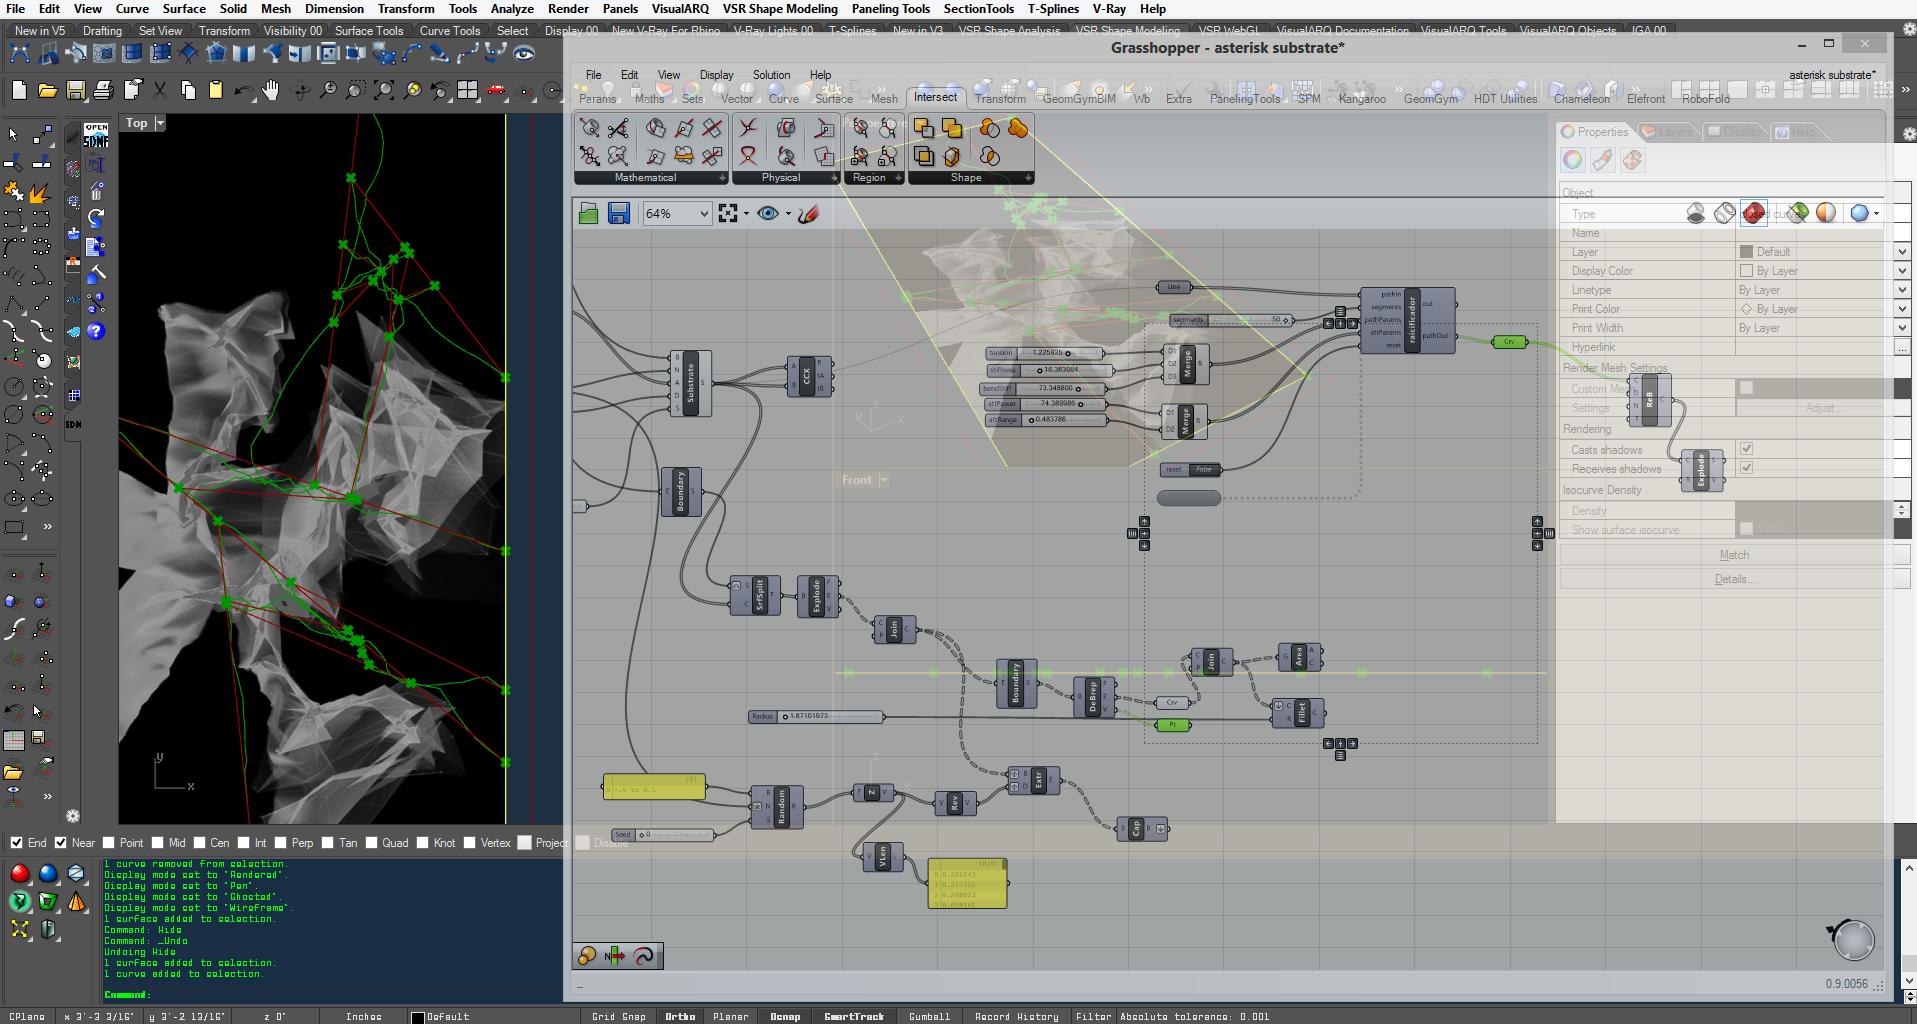 asteriskos-digital-fabrication-diffusion-panel-scripting-grasshopper1.jpg